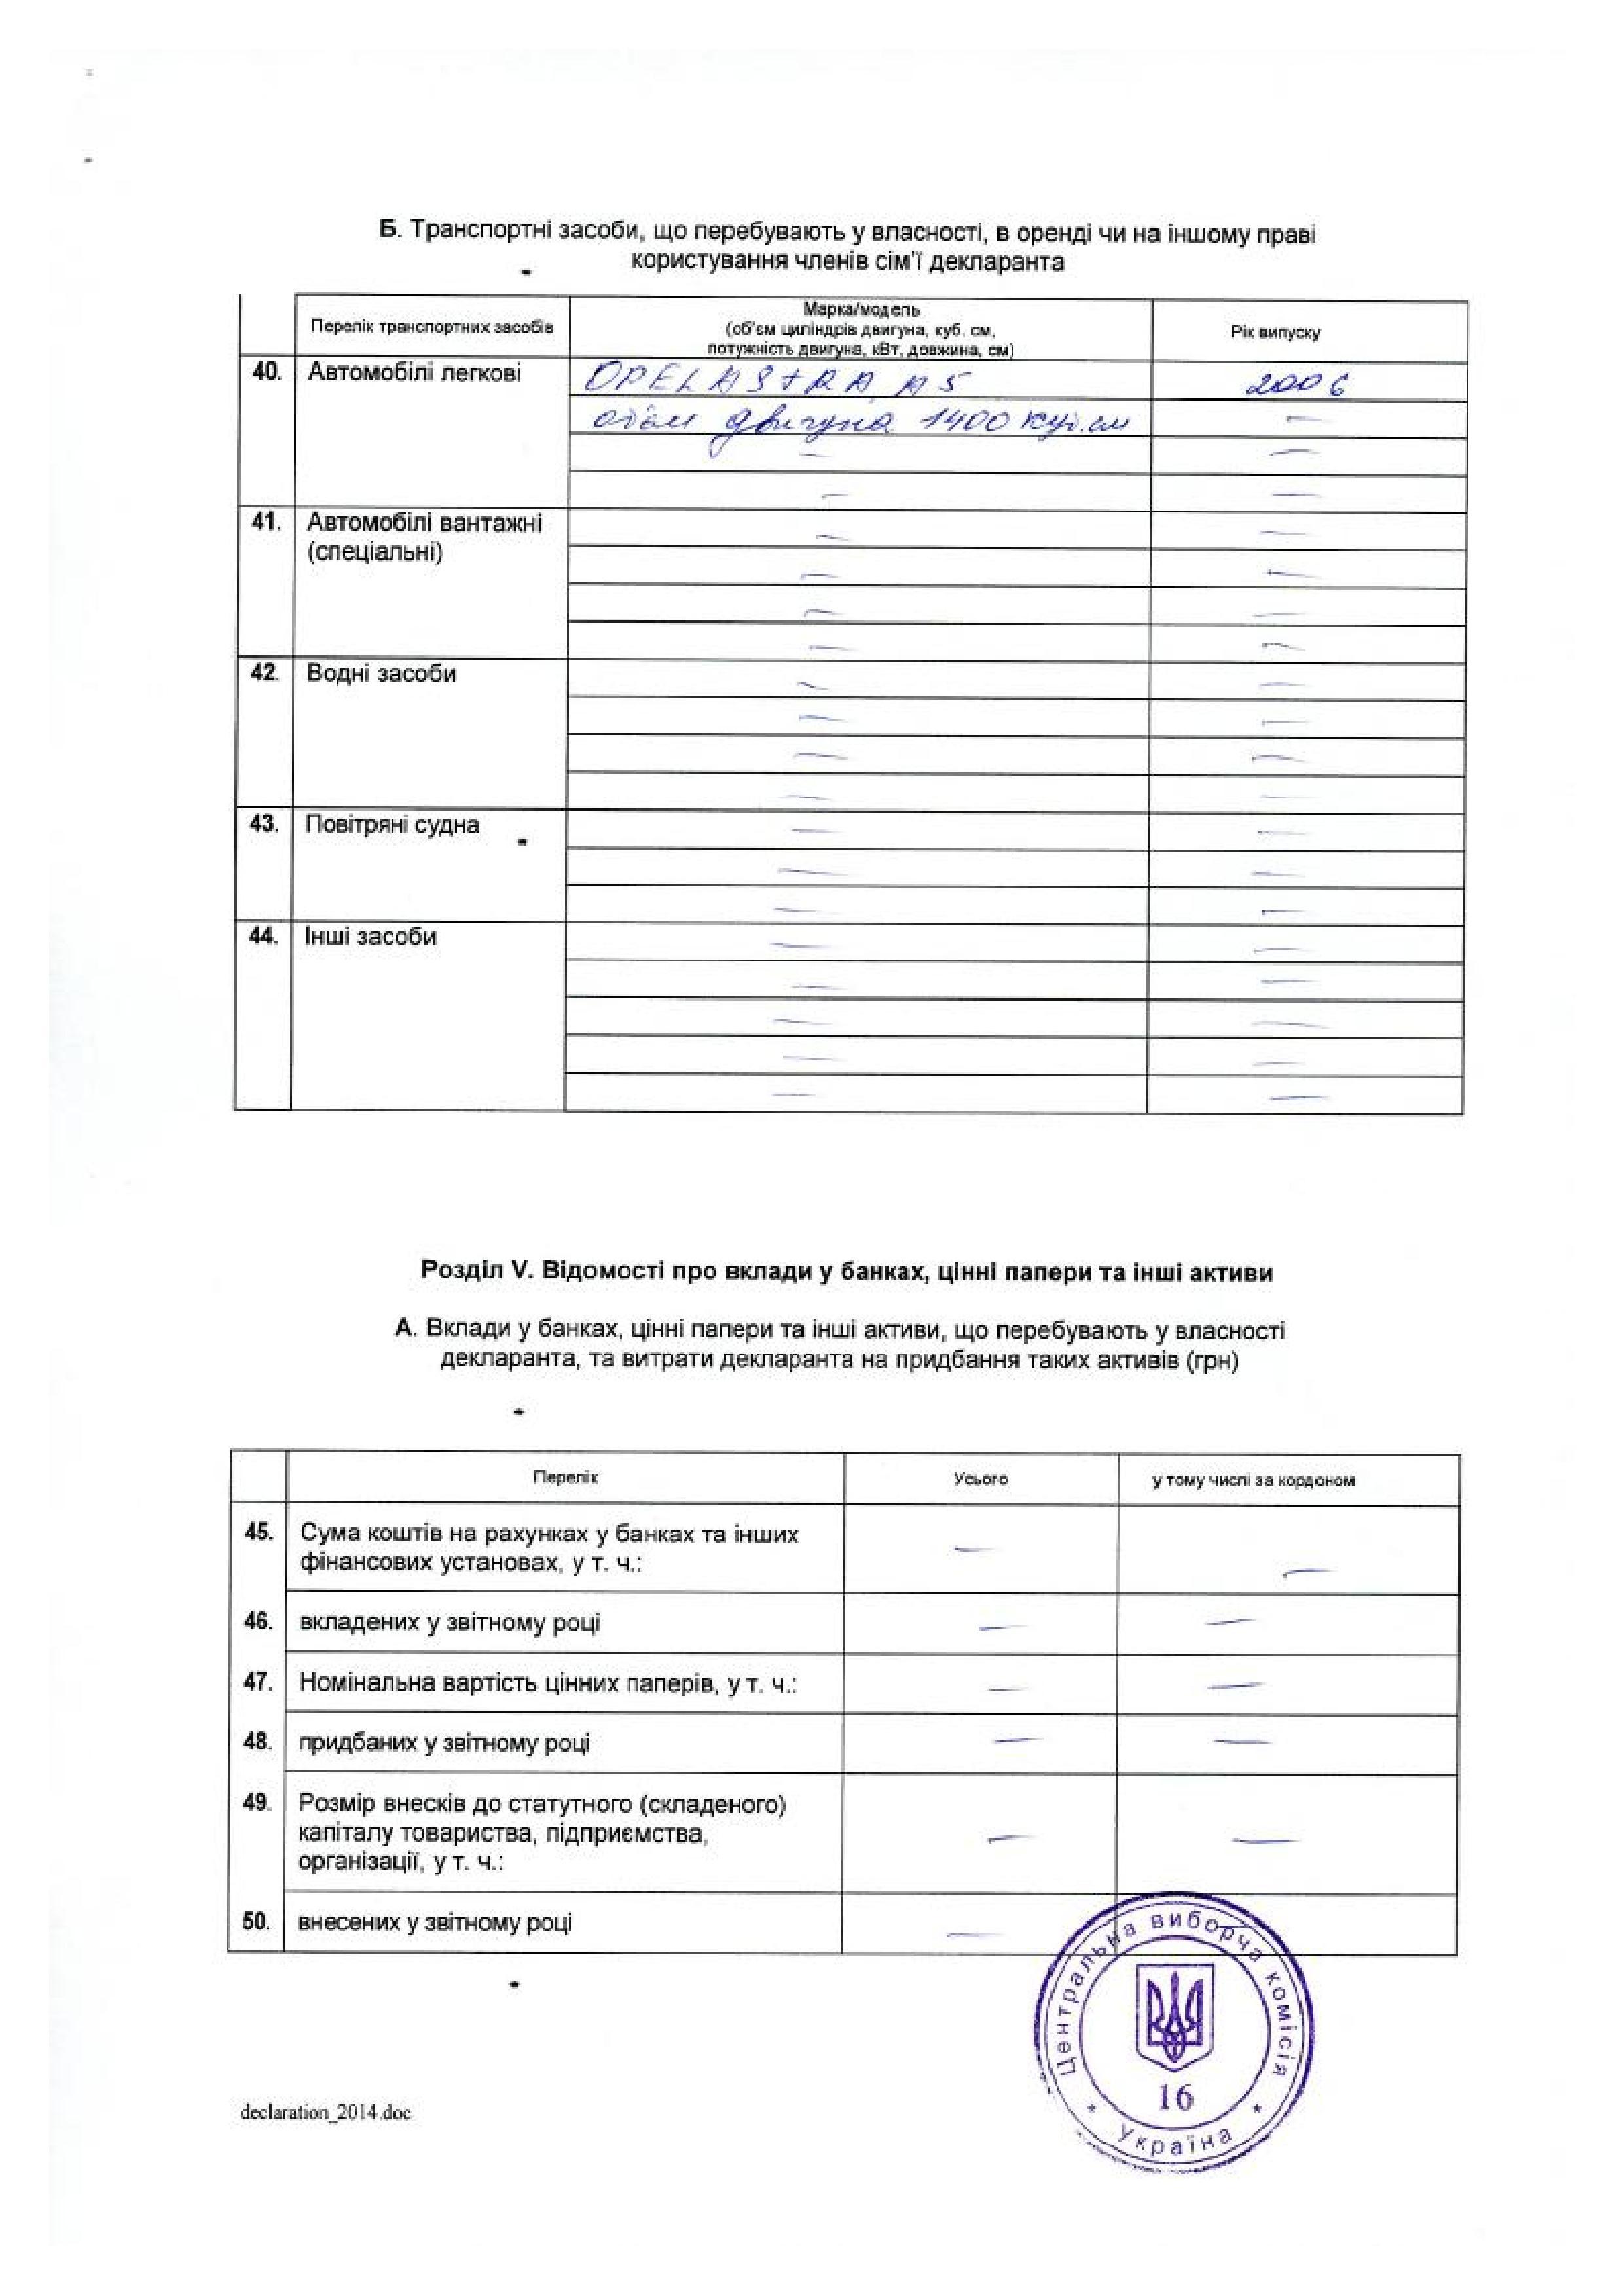 Декларация о доходах Дмитрия Яроша за 2013 год